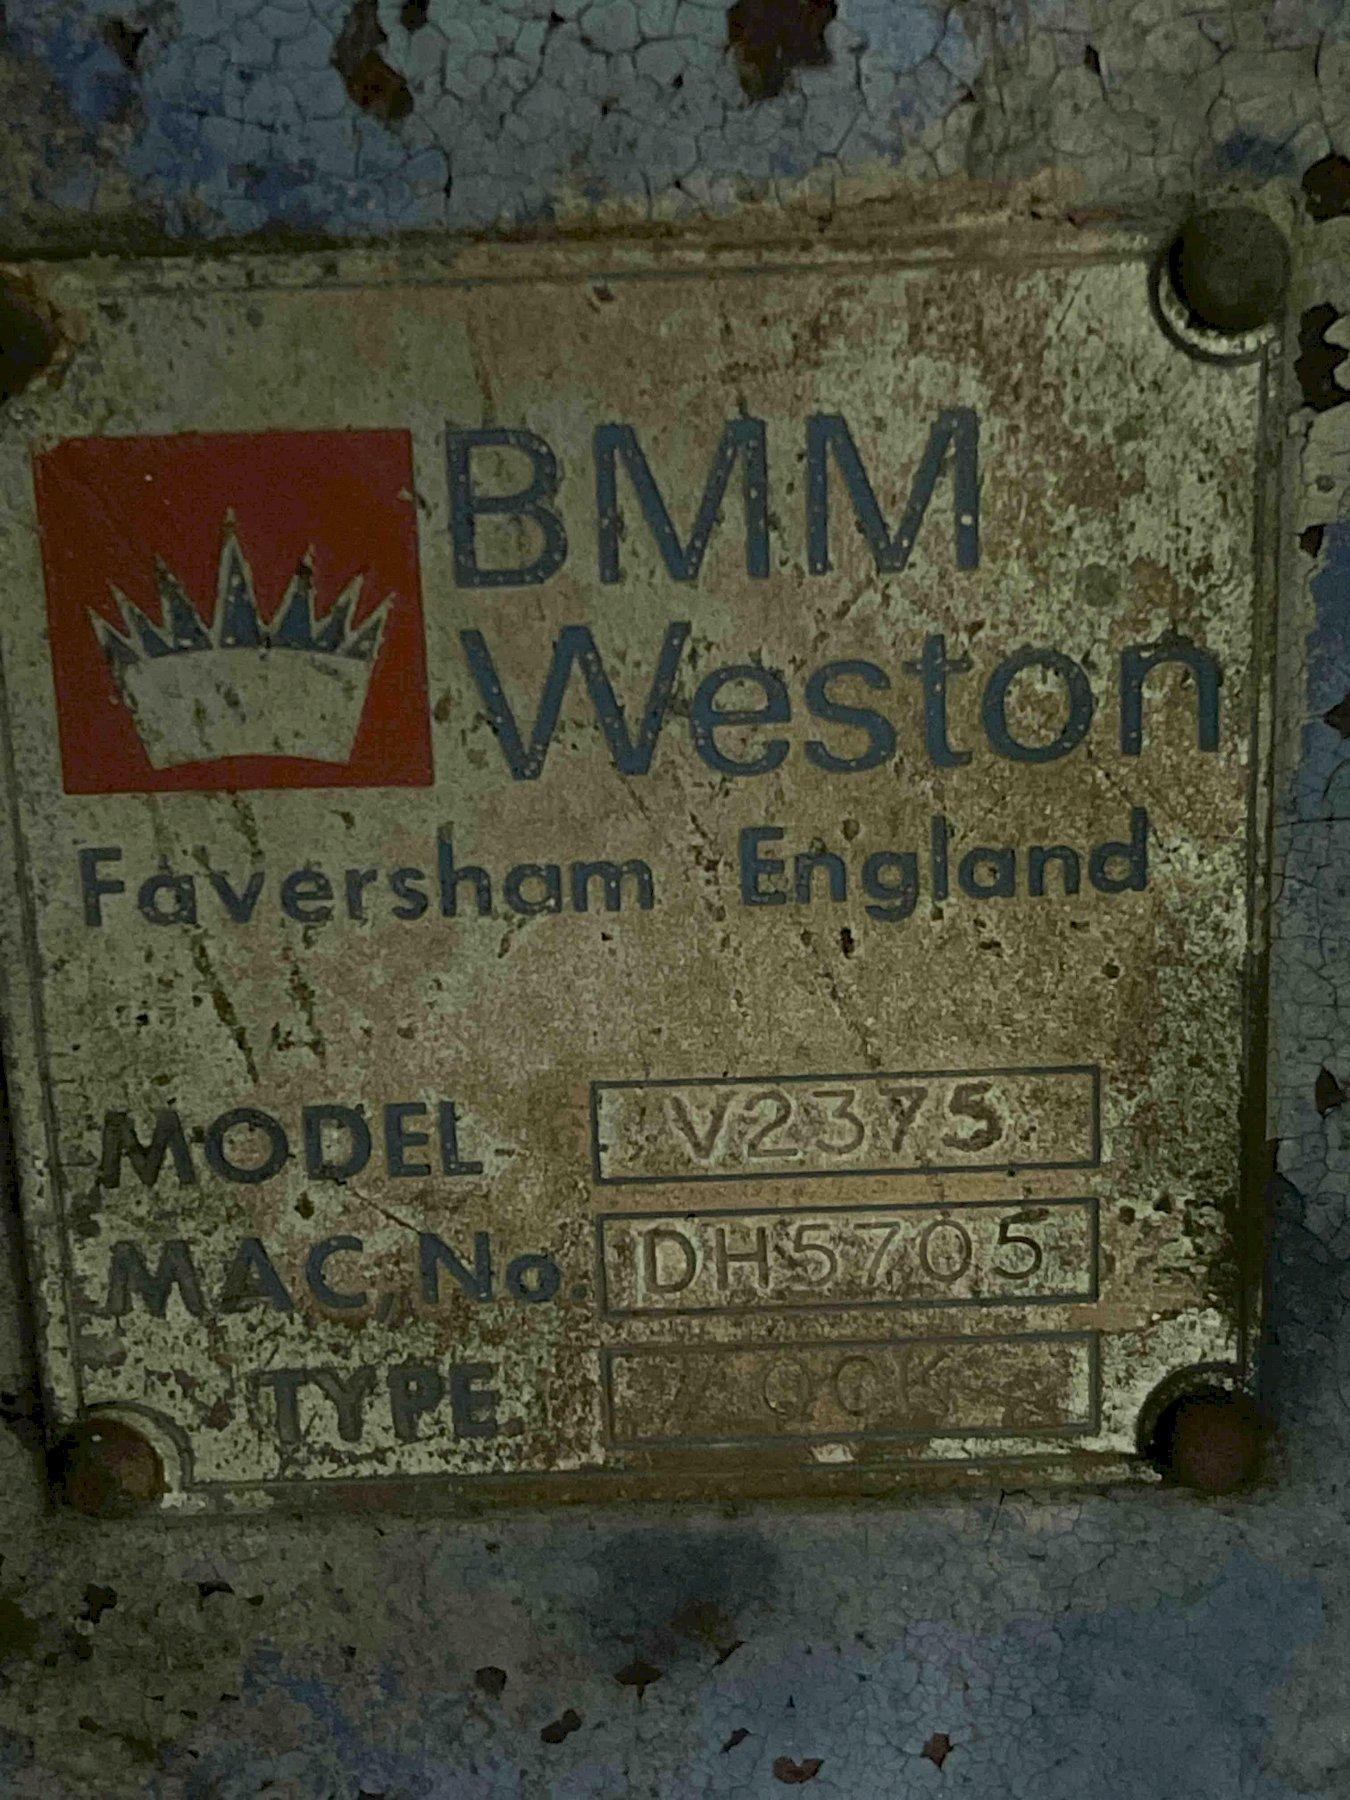 BMM MODEL QCK 2375 JOLT SQUEESE MOLDING MACHINE S/N DH-7540, MODEL V-2669